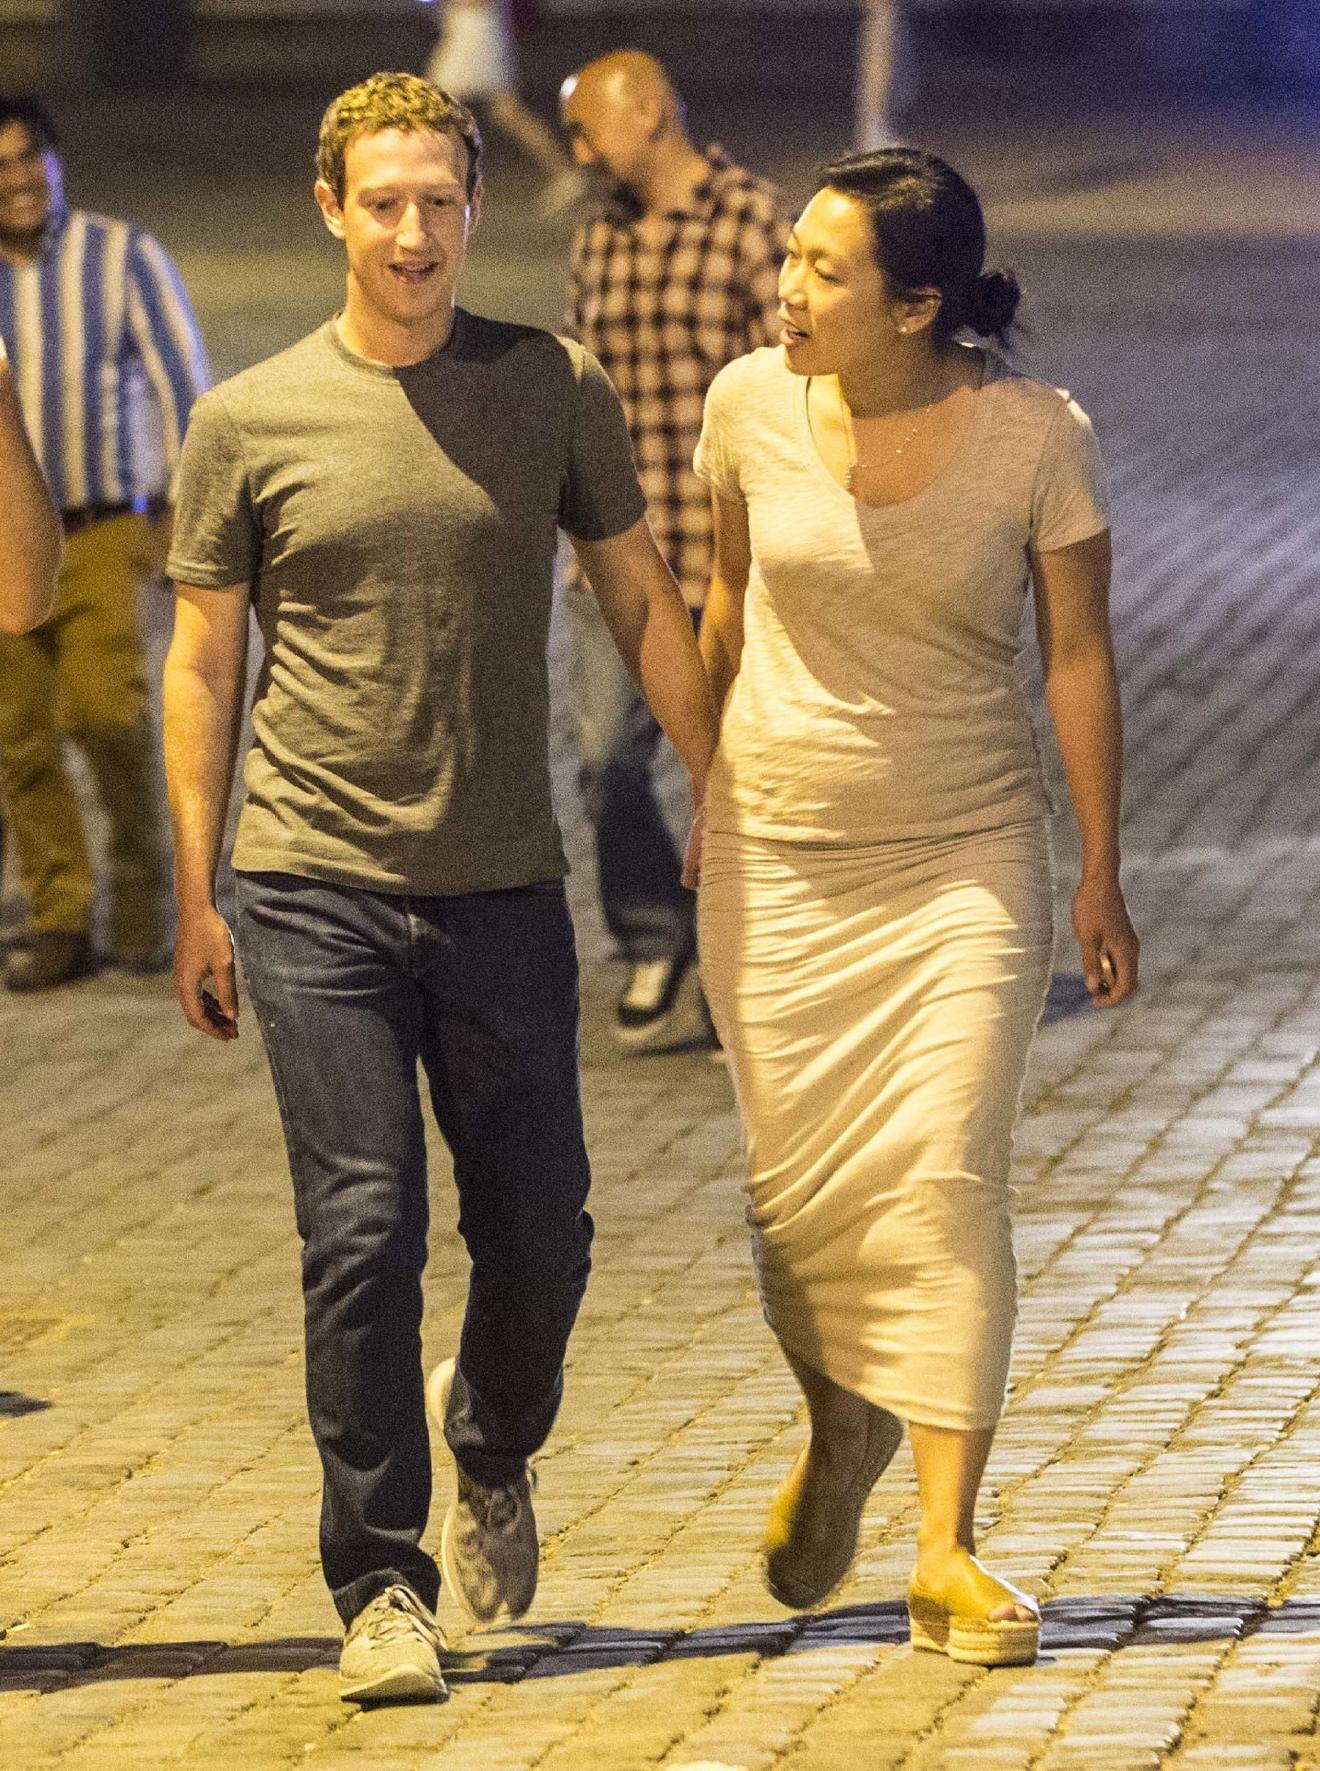 PHOTOS Mark Zuckerberg And Wife Enjoy Late Night Tour Of